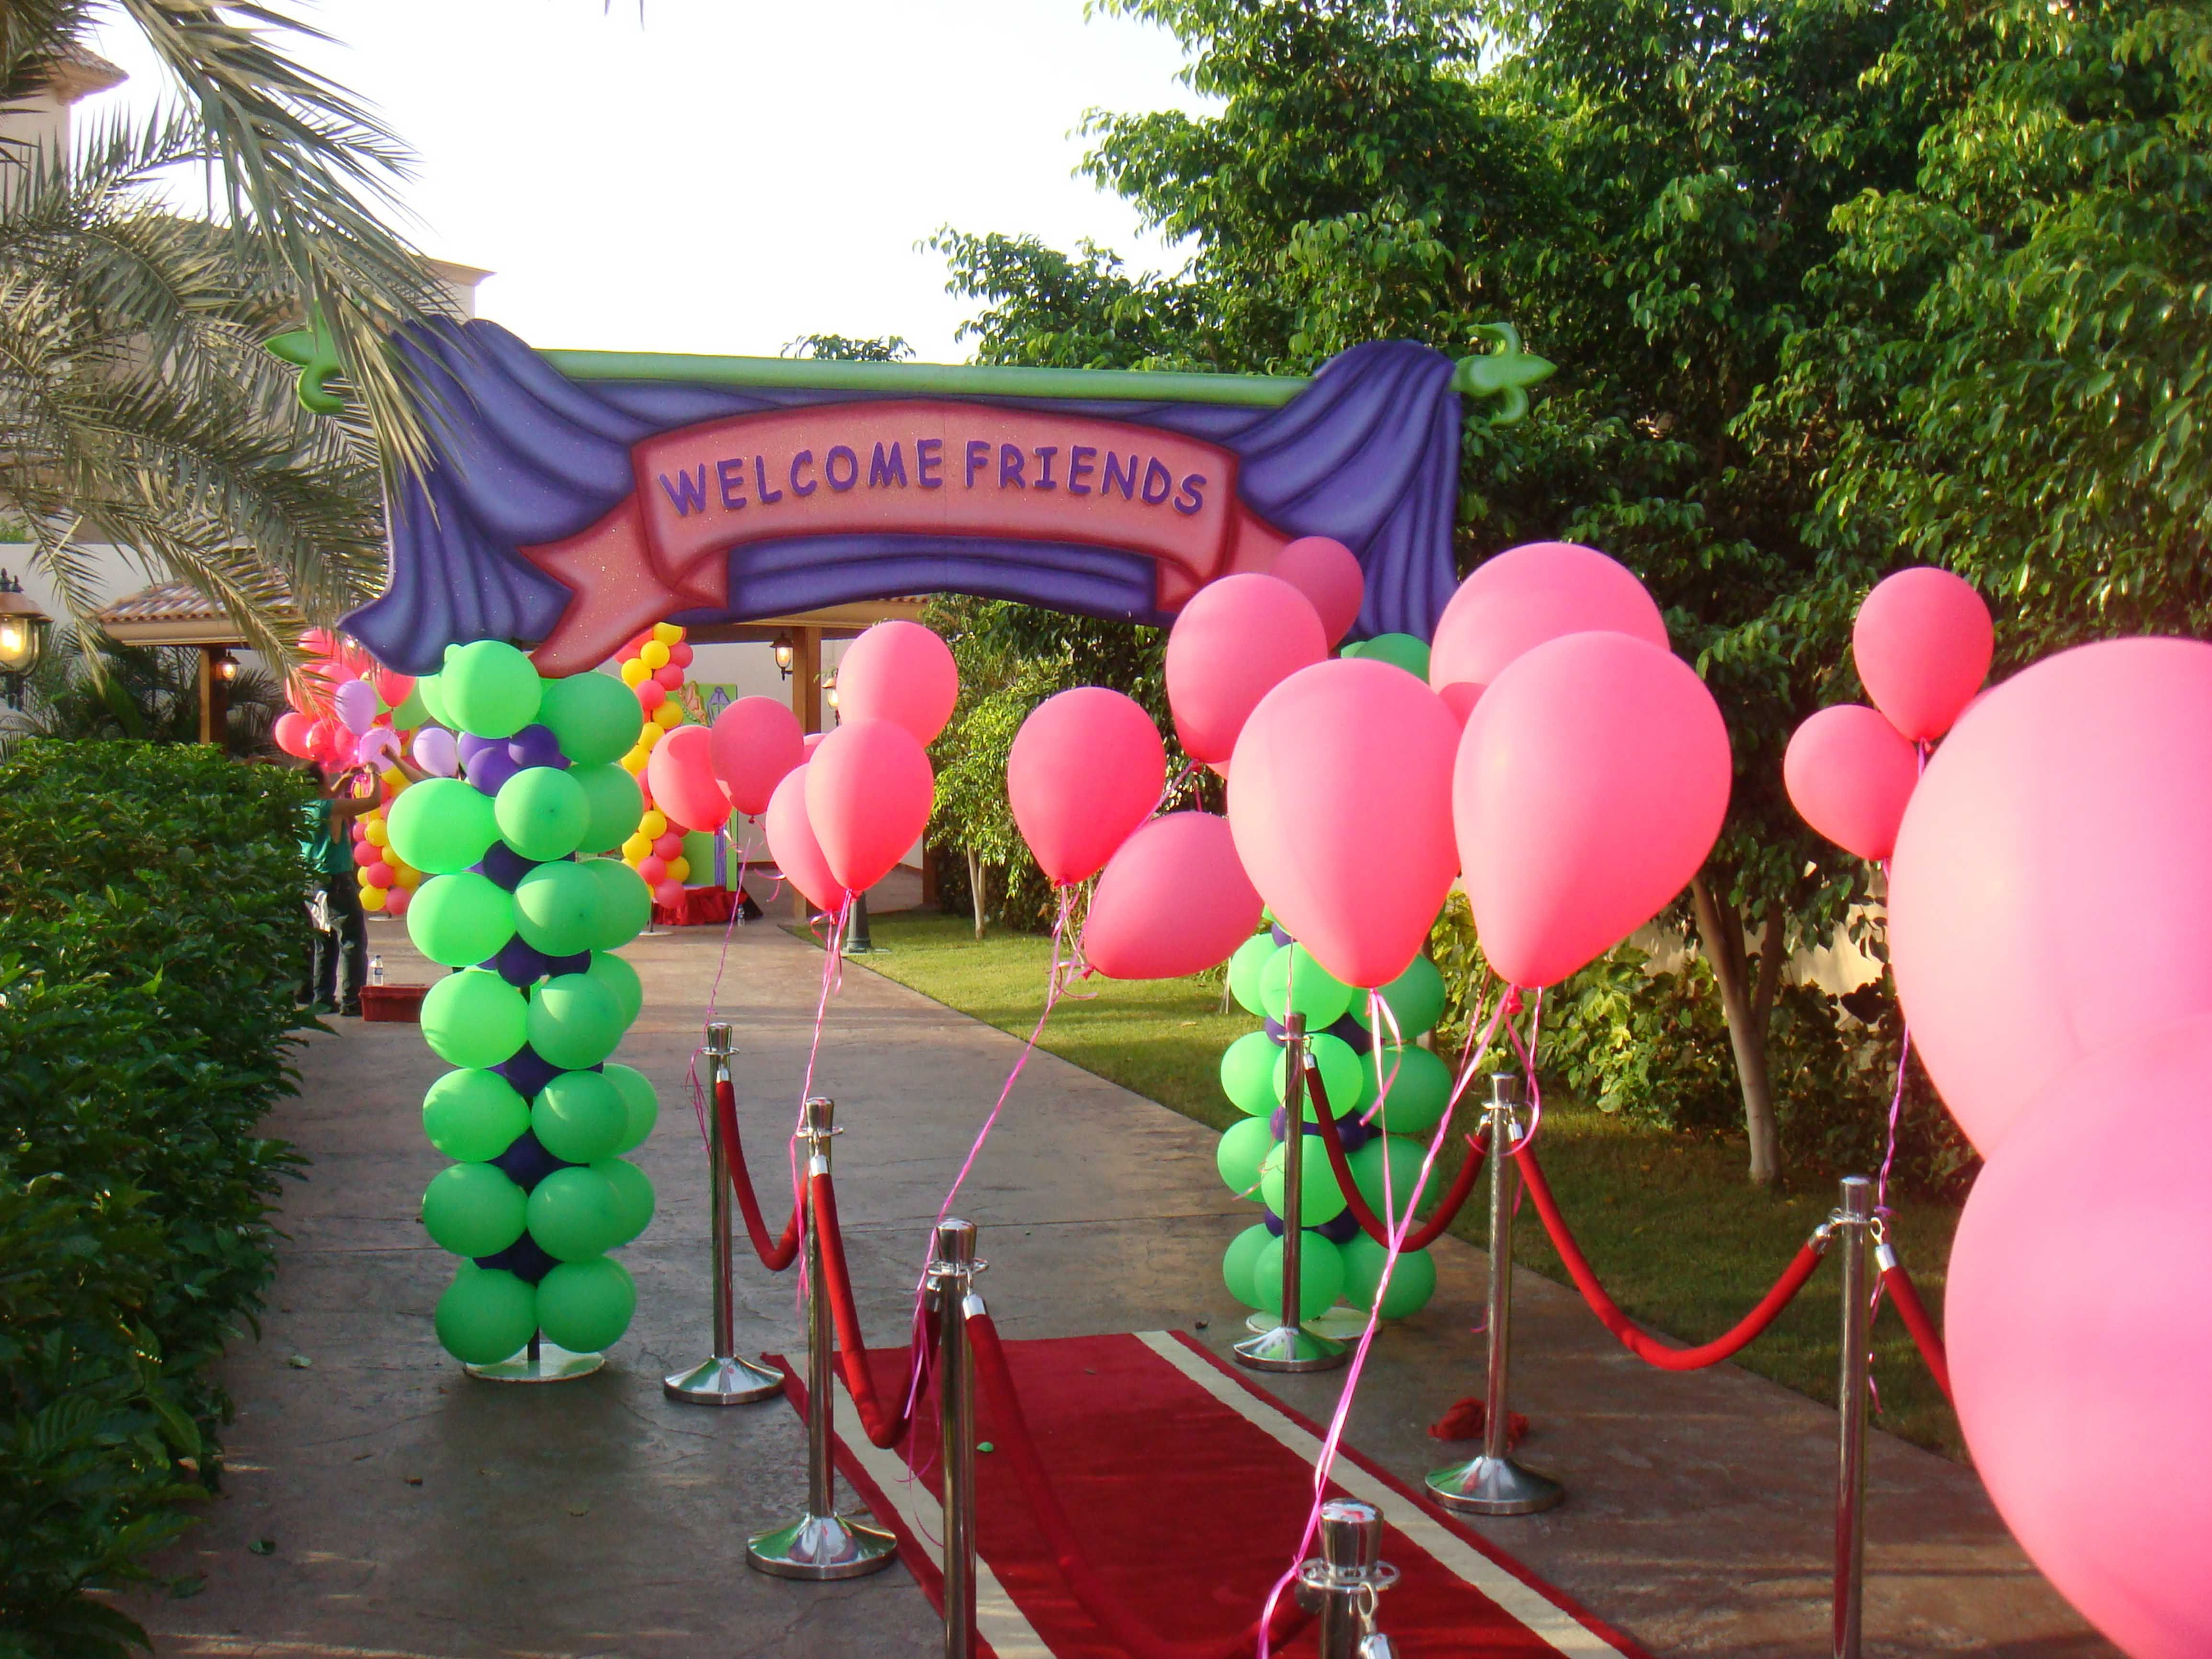 Entrance Balloon Decoration By Fantasyparty Balloon Decorations